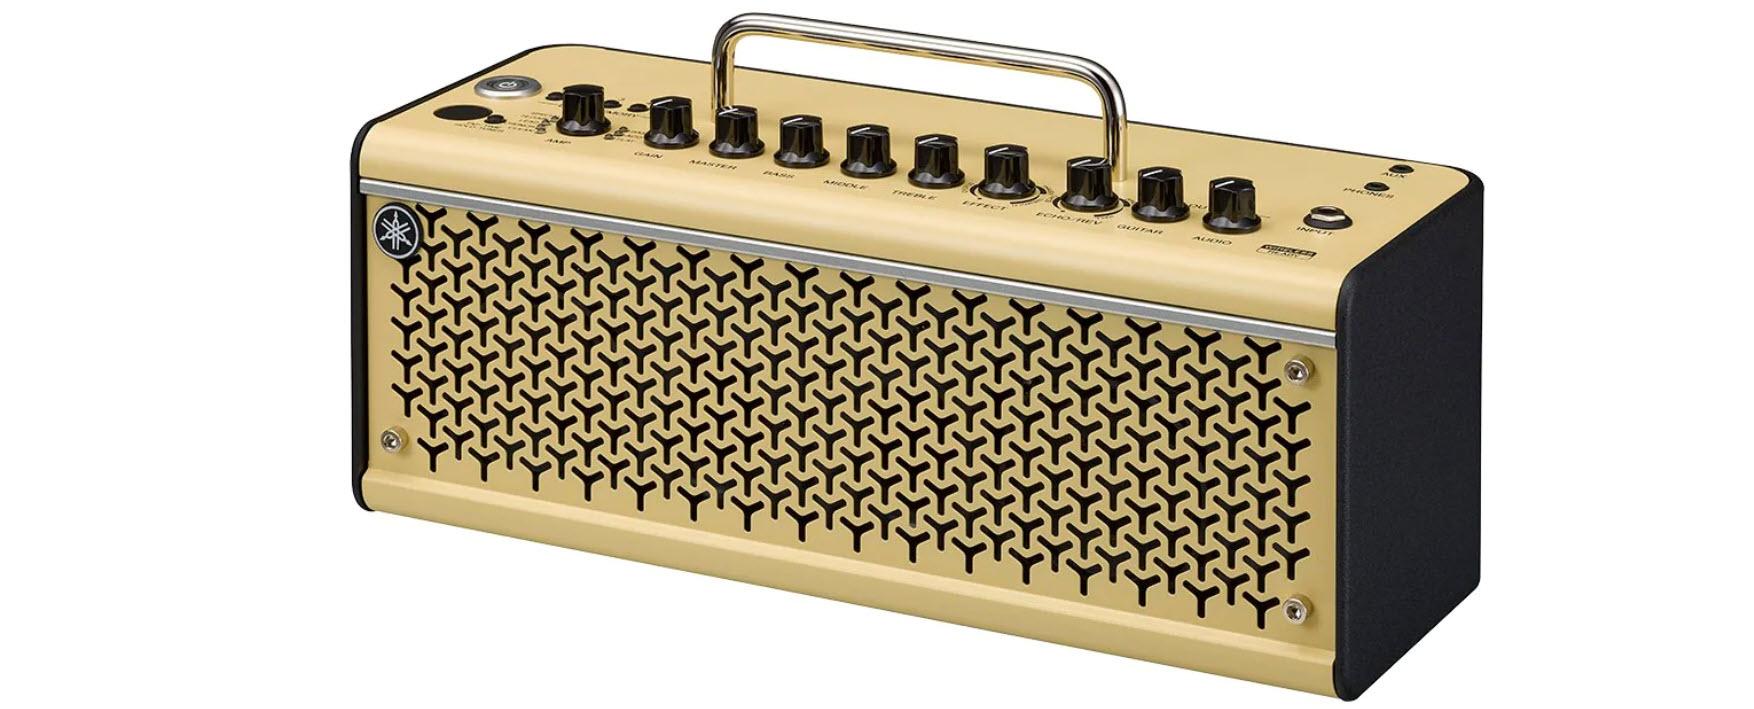 Small portable guitar amp.